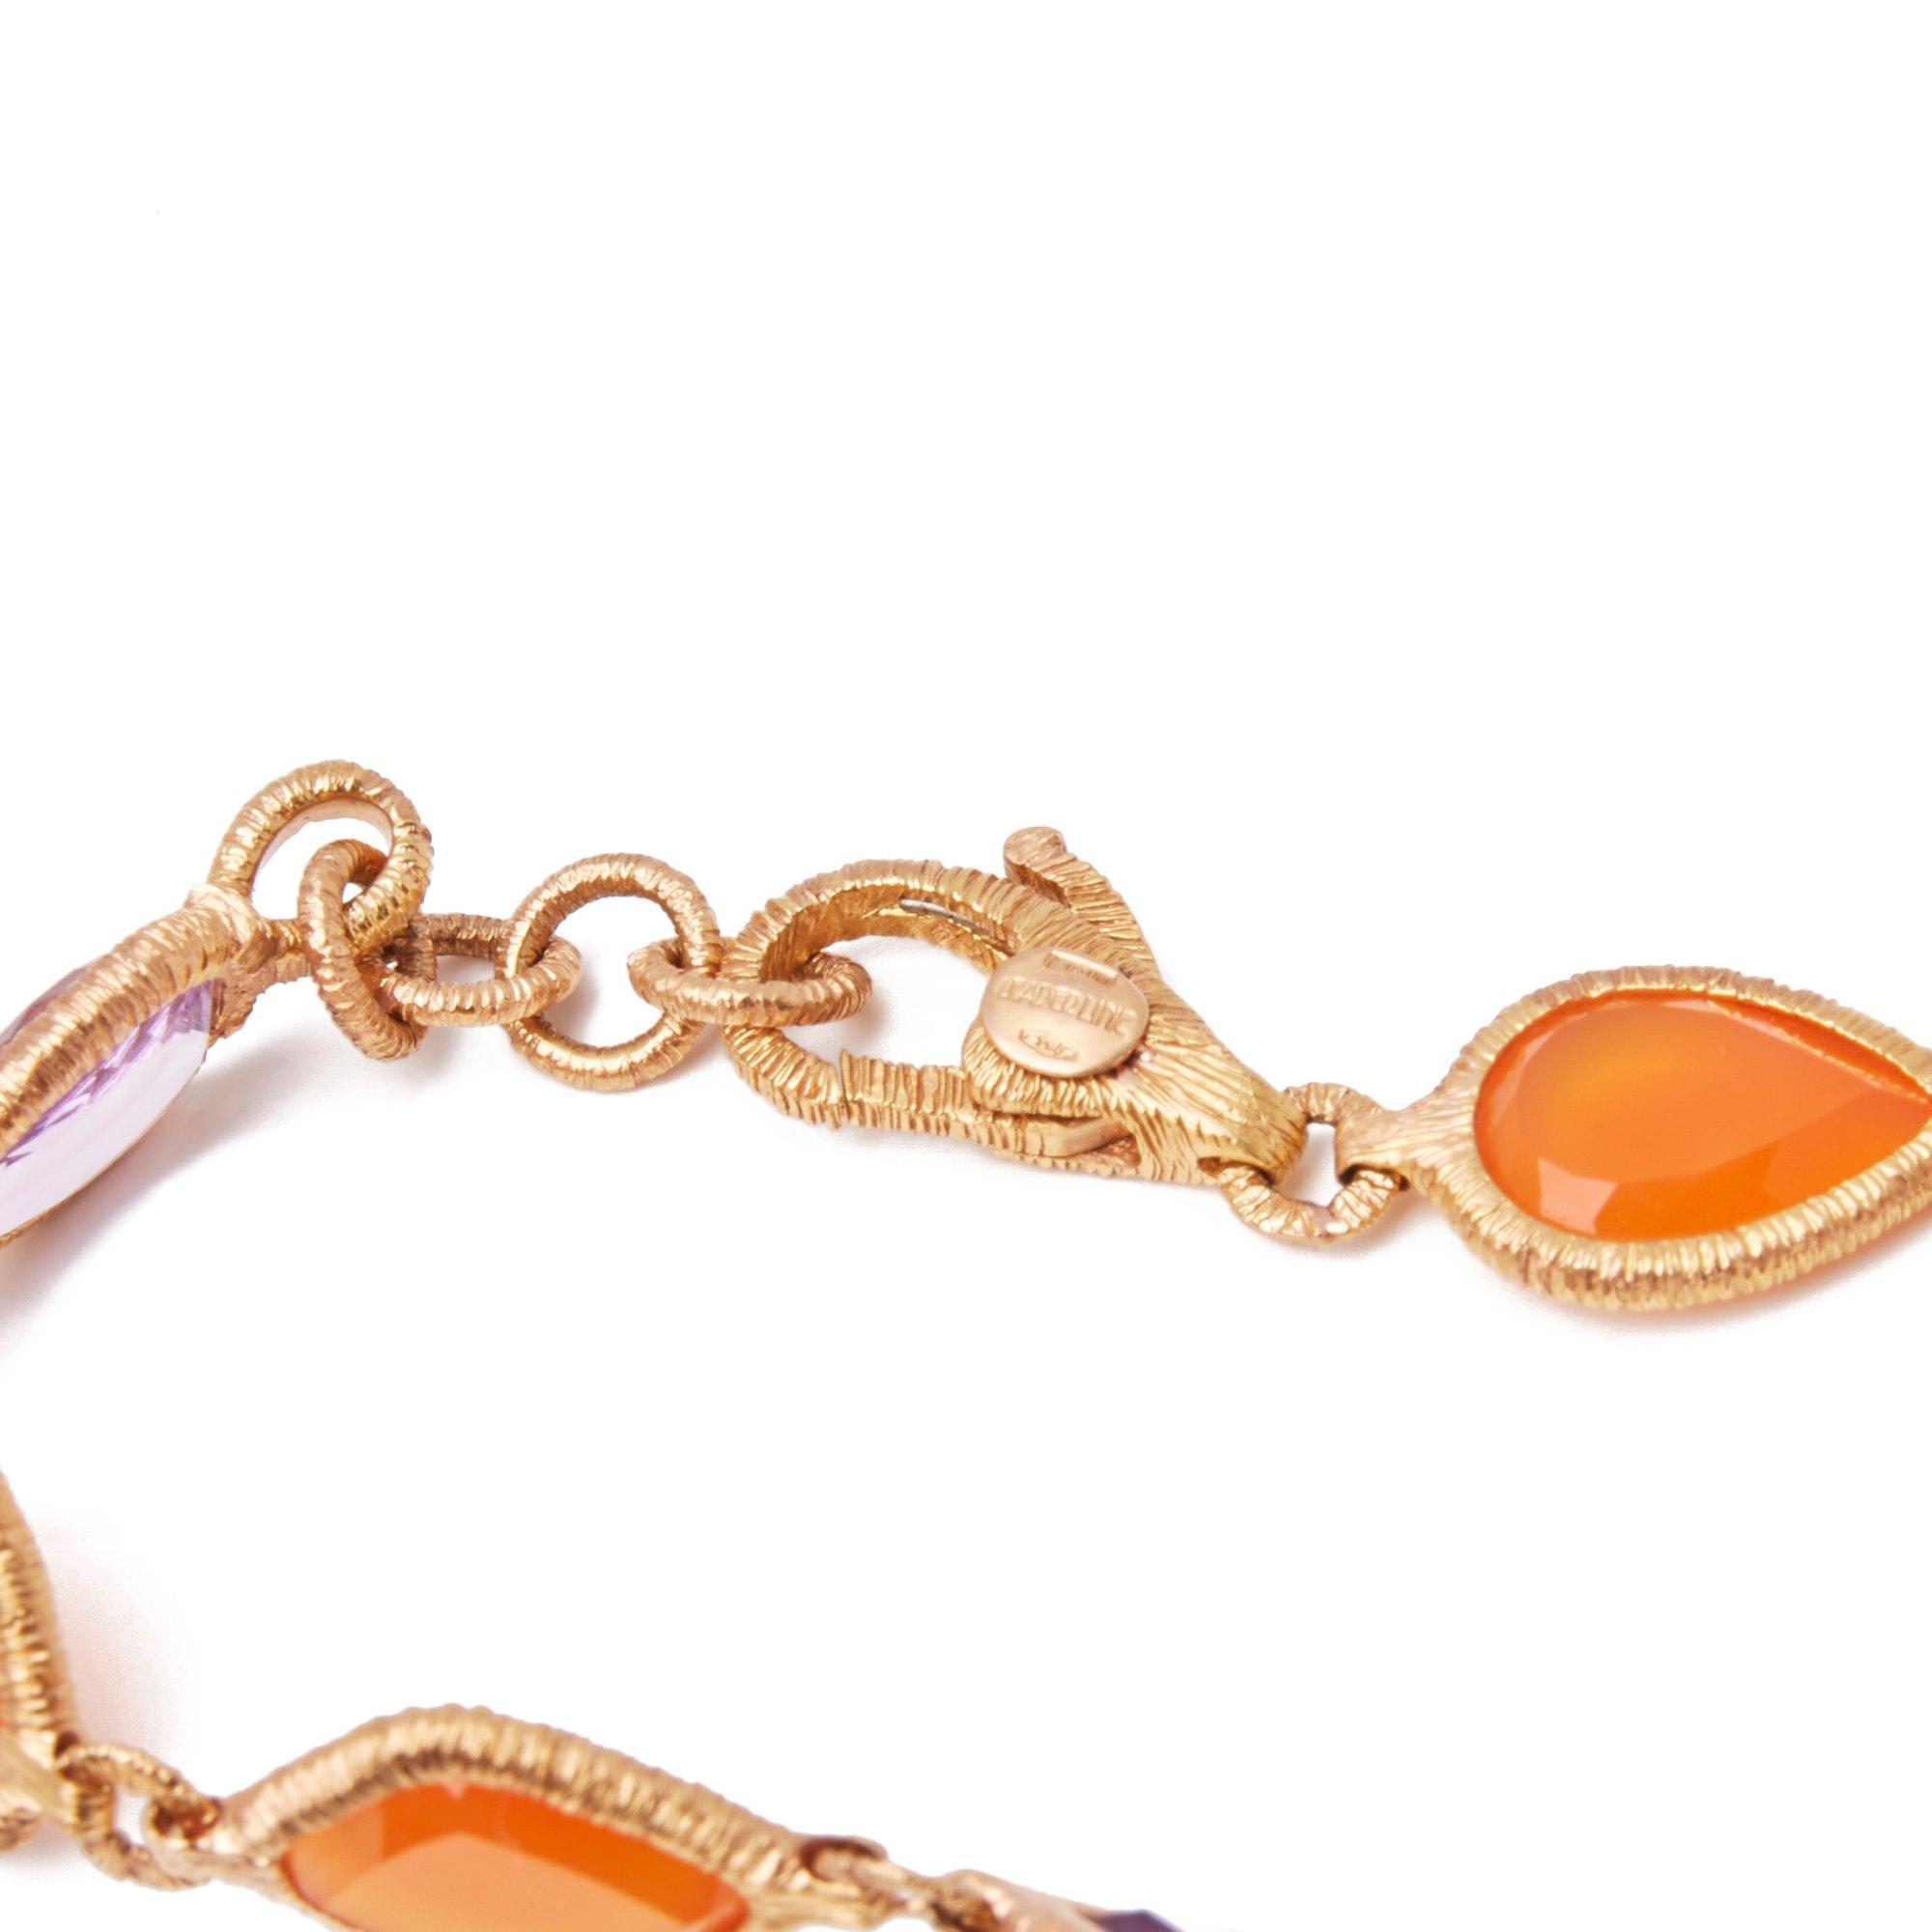 Amethist 18k Yellow Gold Carnelian and Amethyst Bracelet